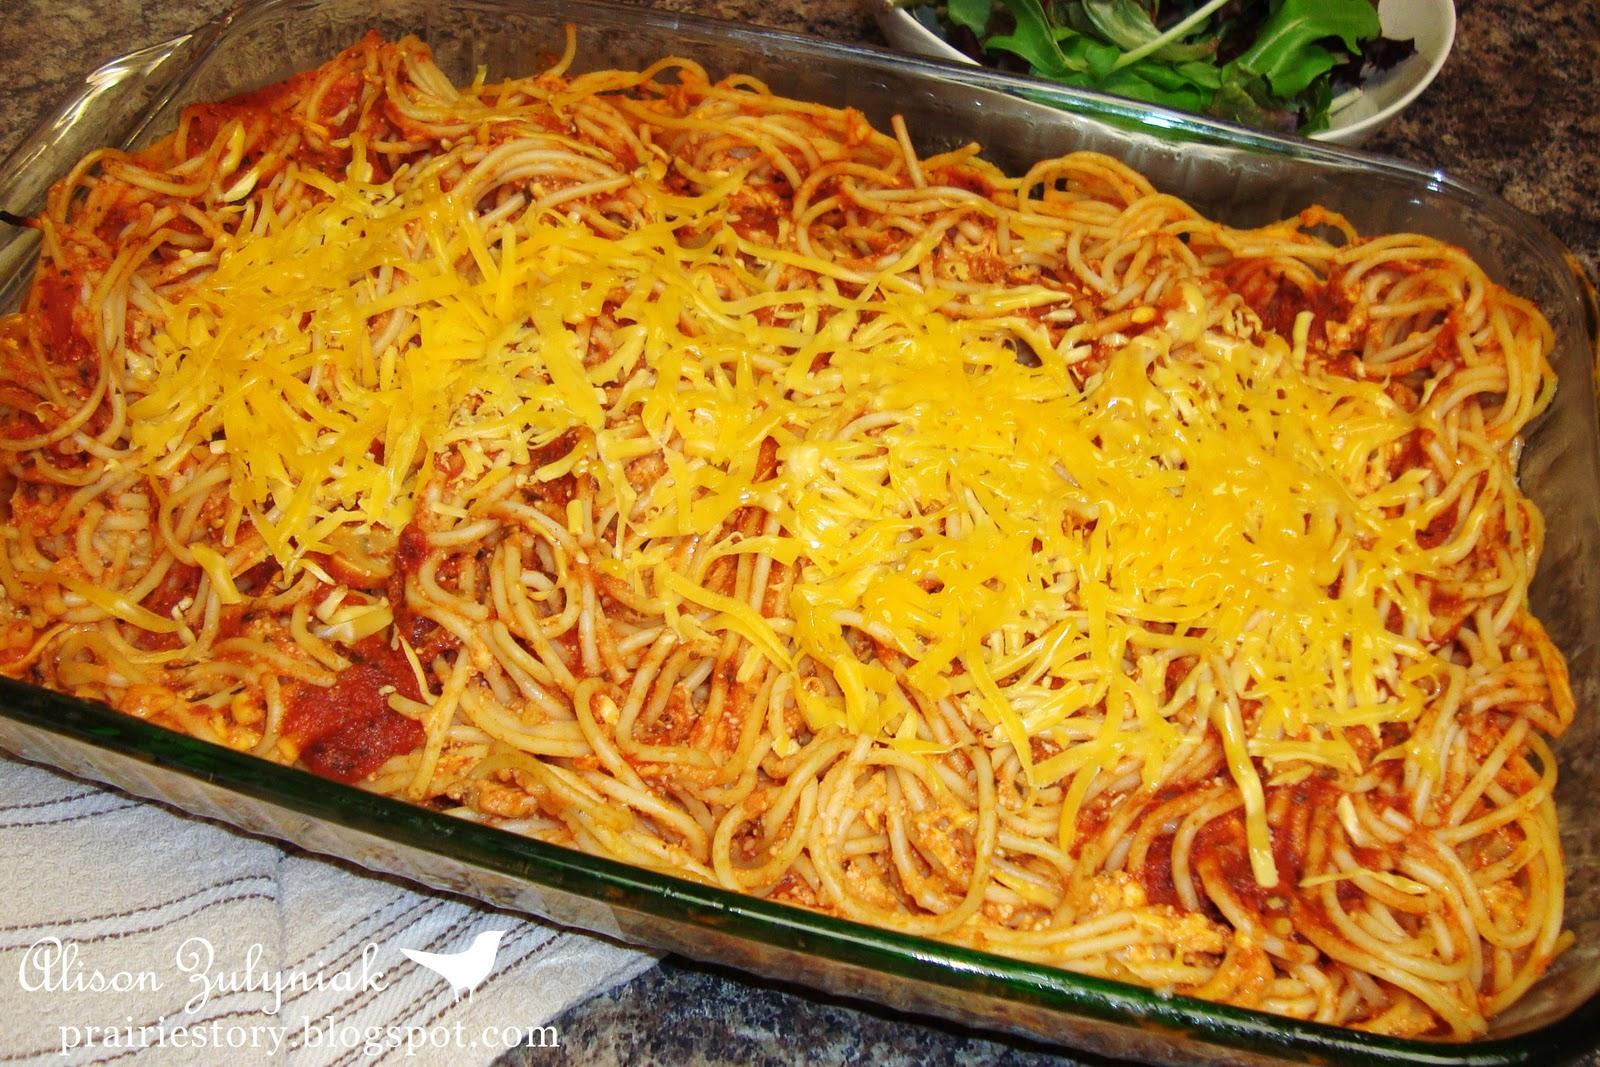 Prairie Story: Baked Spaghetti